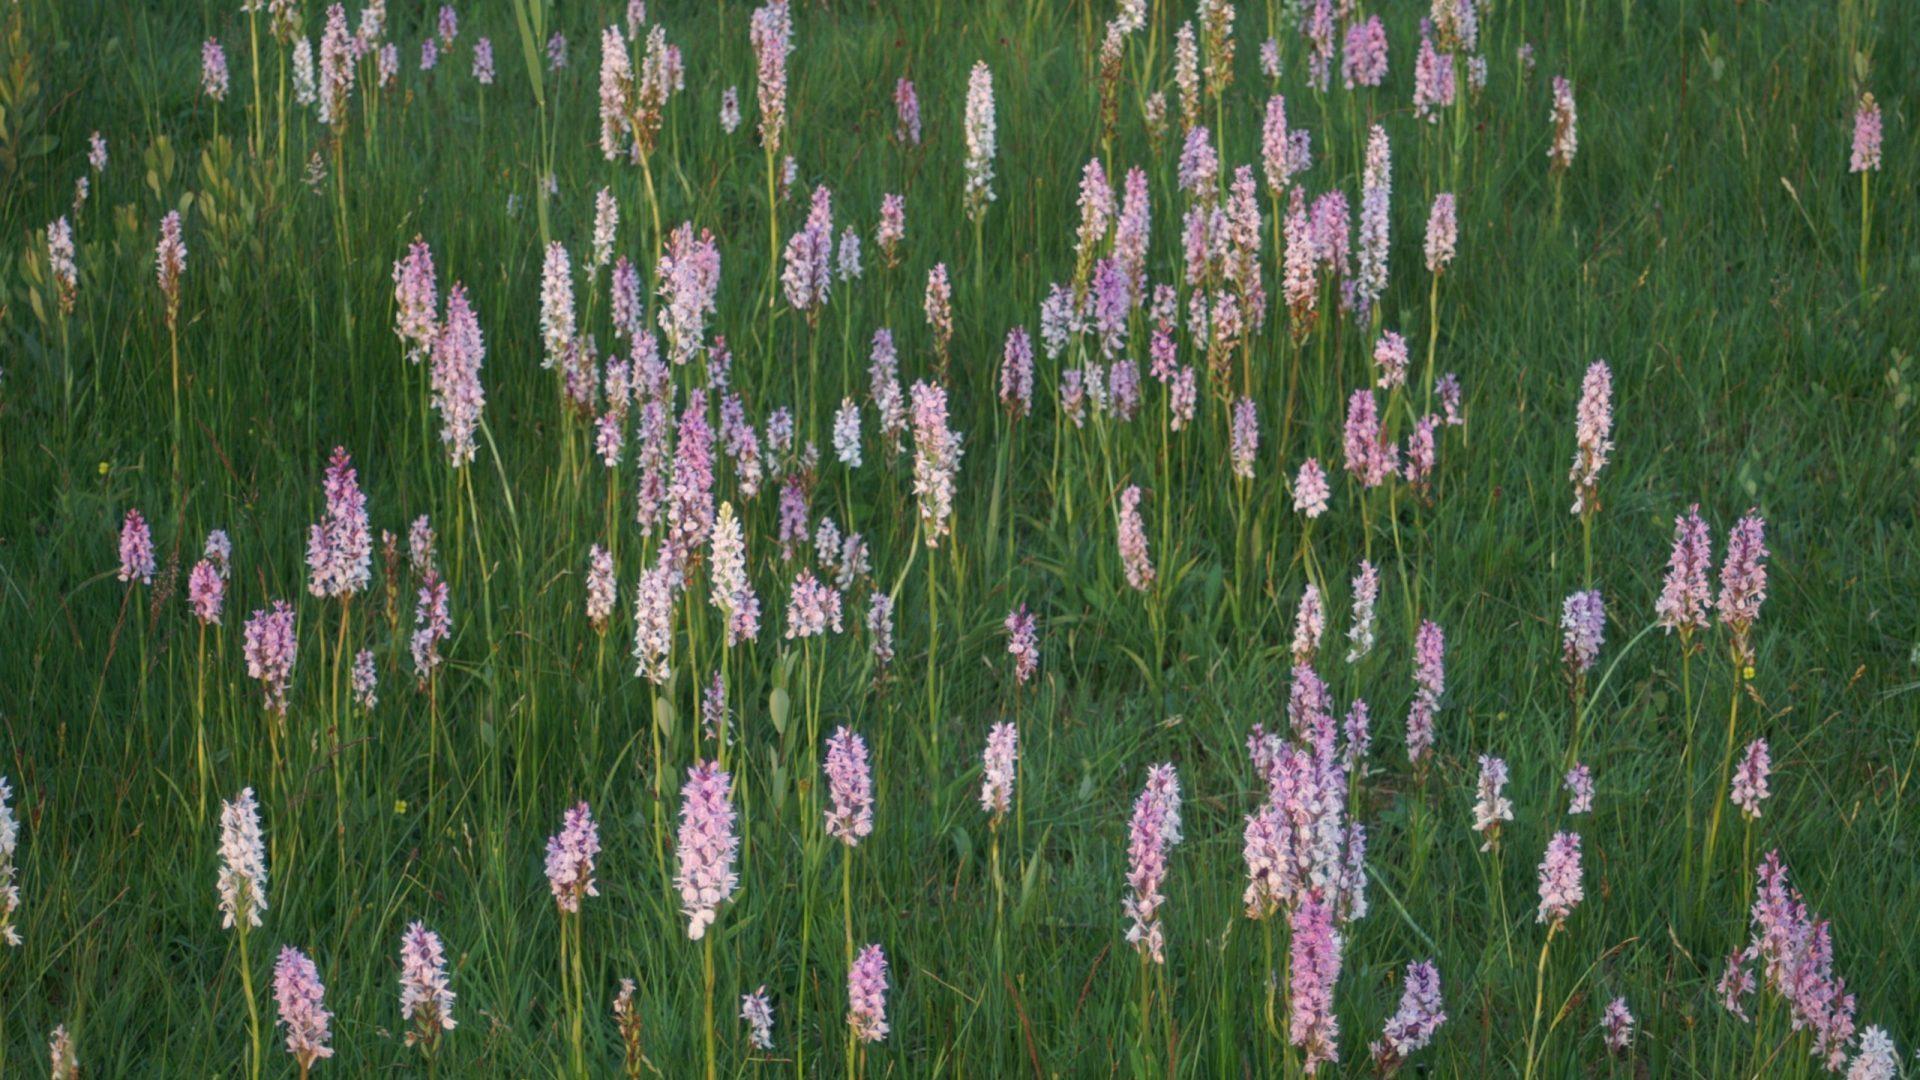 Orchideeën bloemrijk grasland